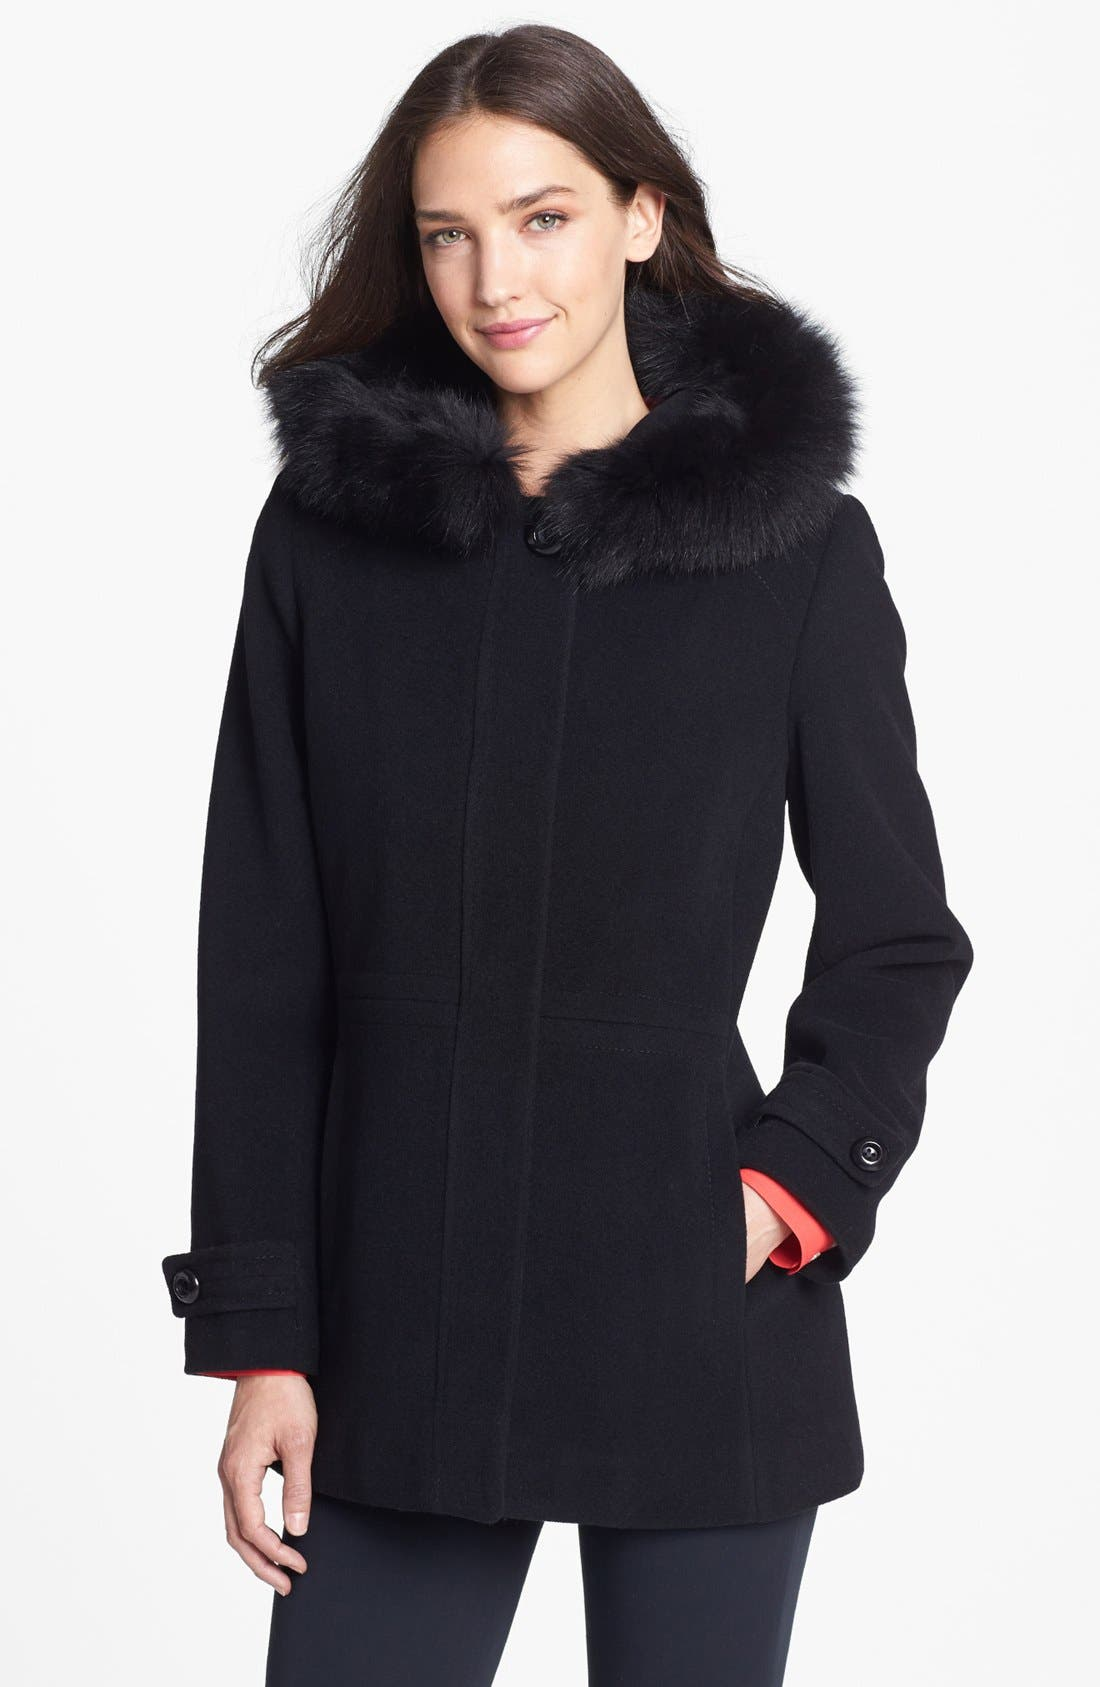 Alternate Image 1 Selected - Sachi Genuine Fox Fur Trim Hooded Coat (Regular & Petite)(Nordstrom Exclusive)